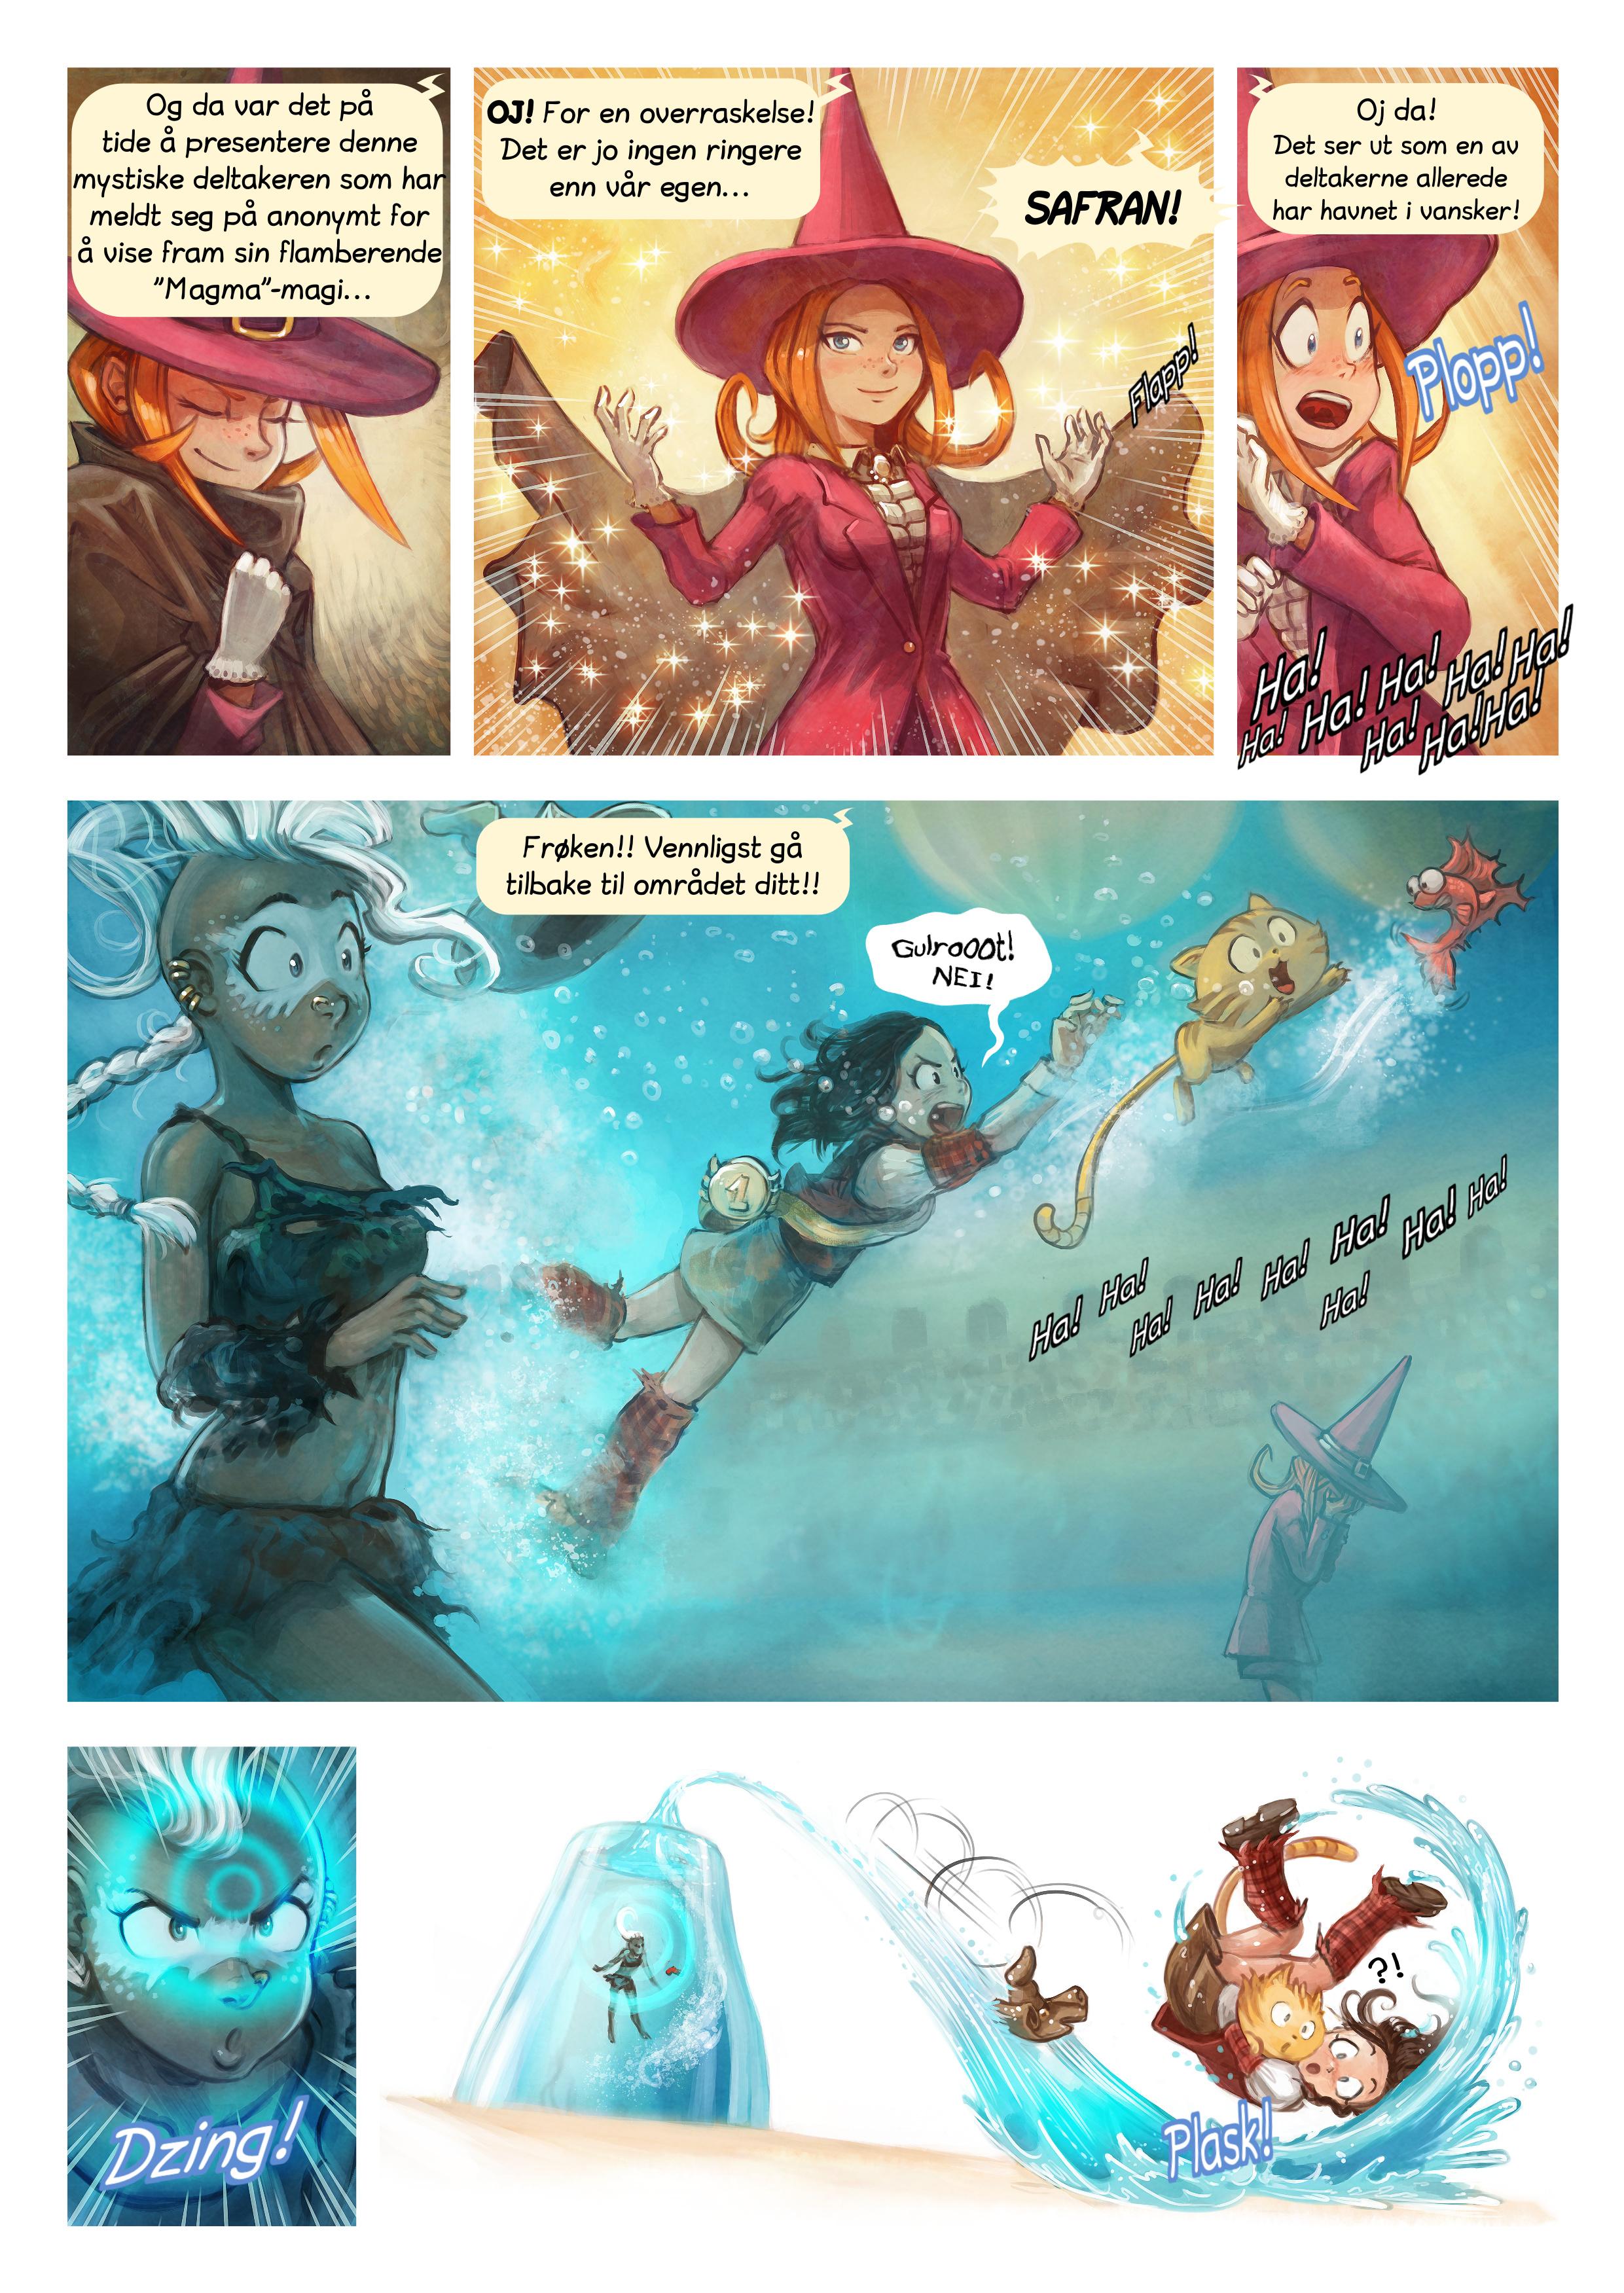 Episode 21: Tryllekonkurransen, Page 6